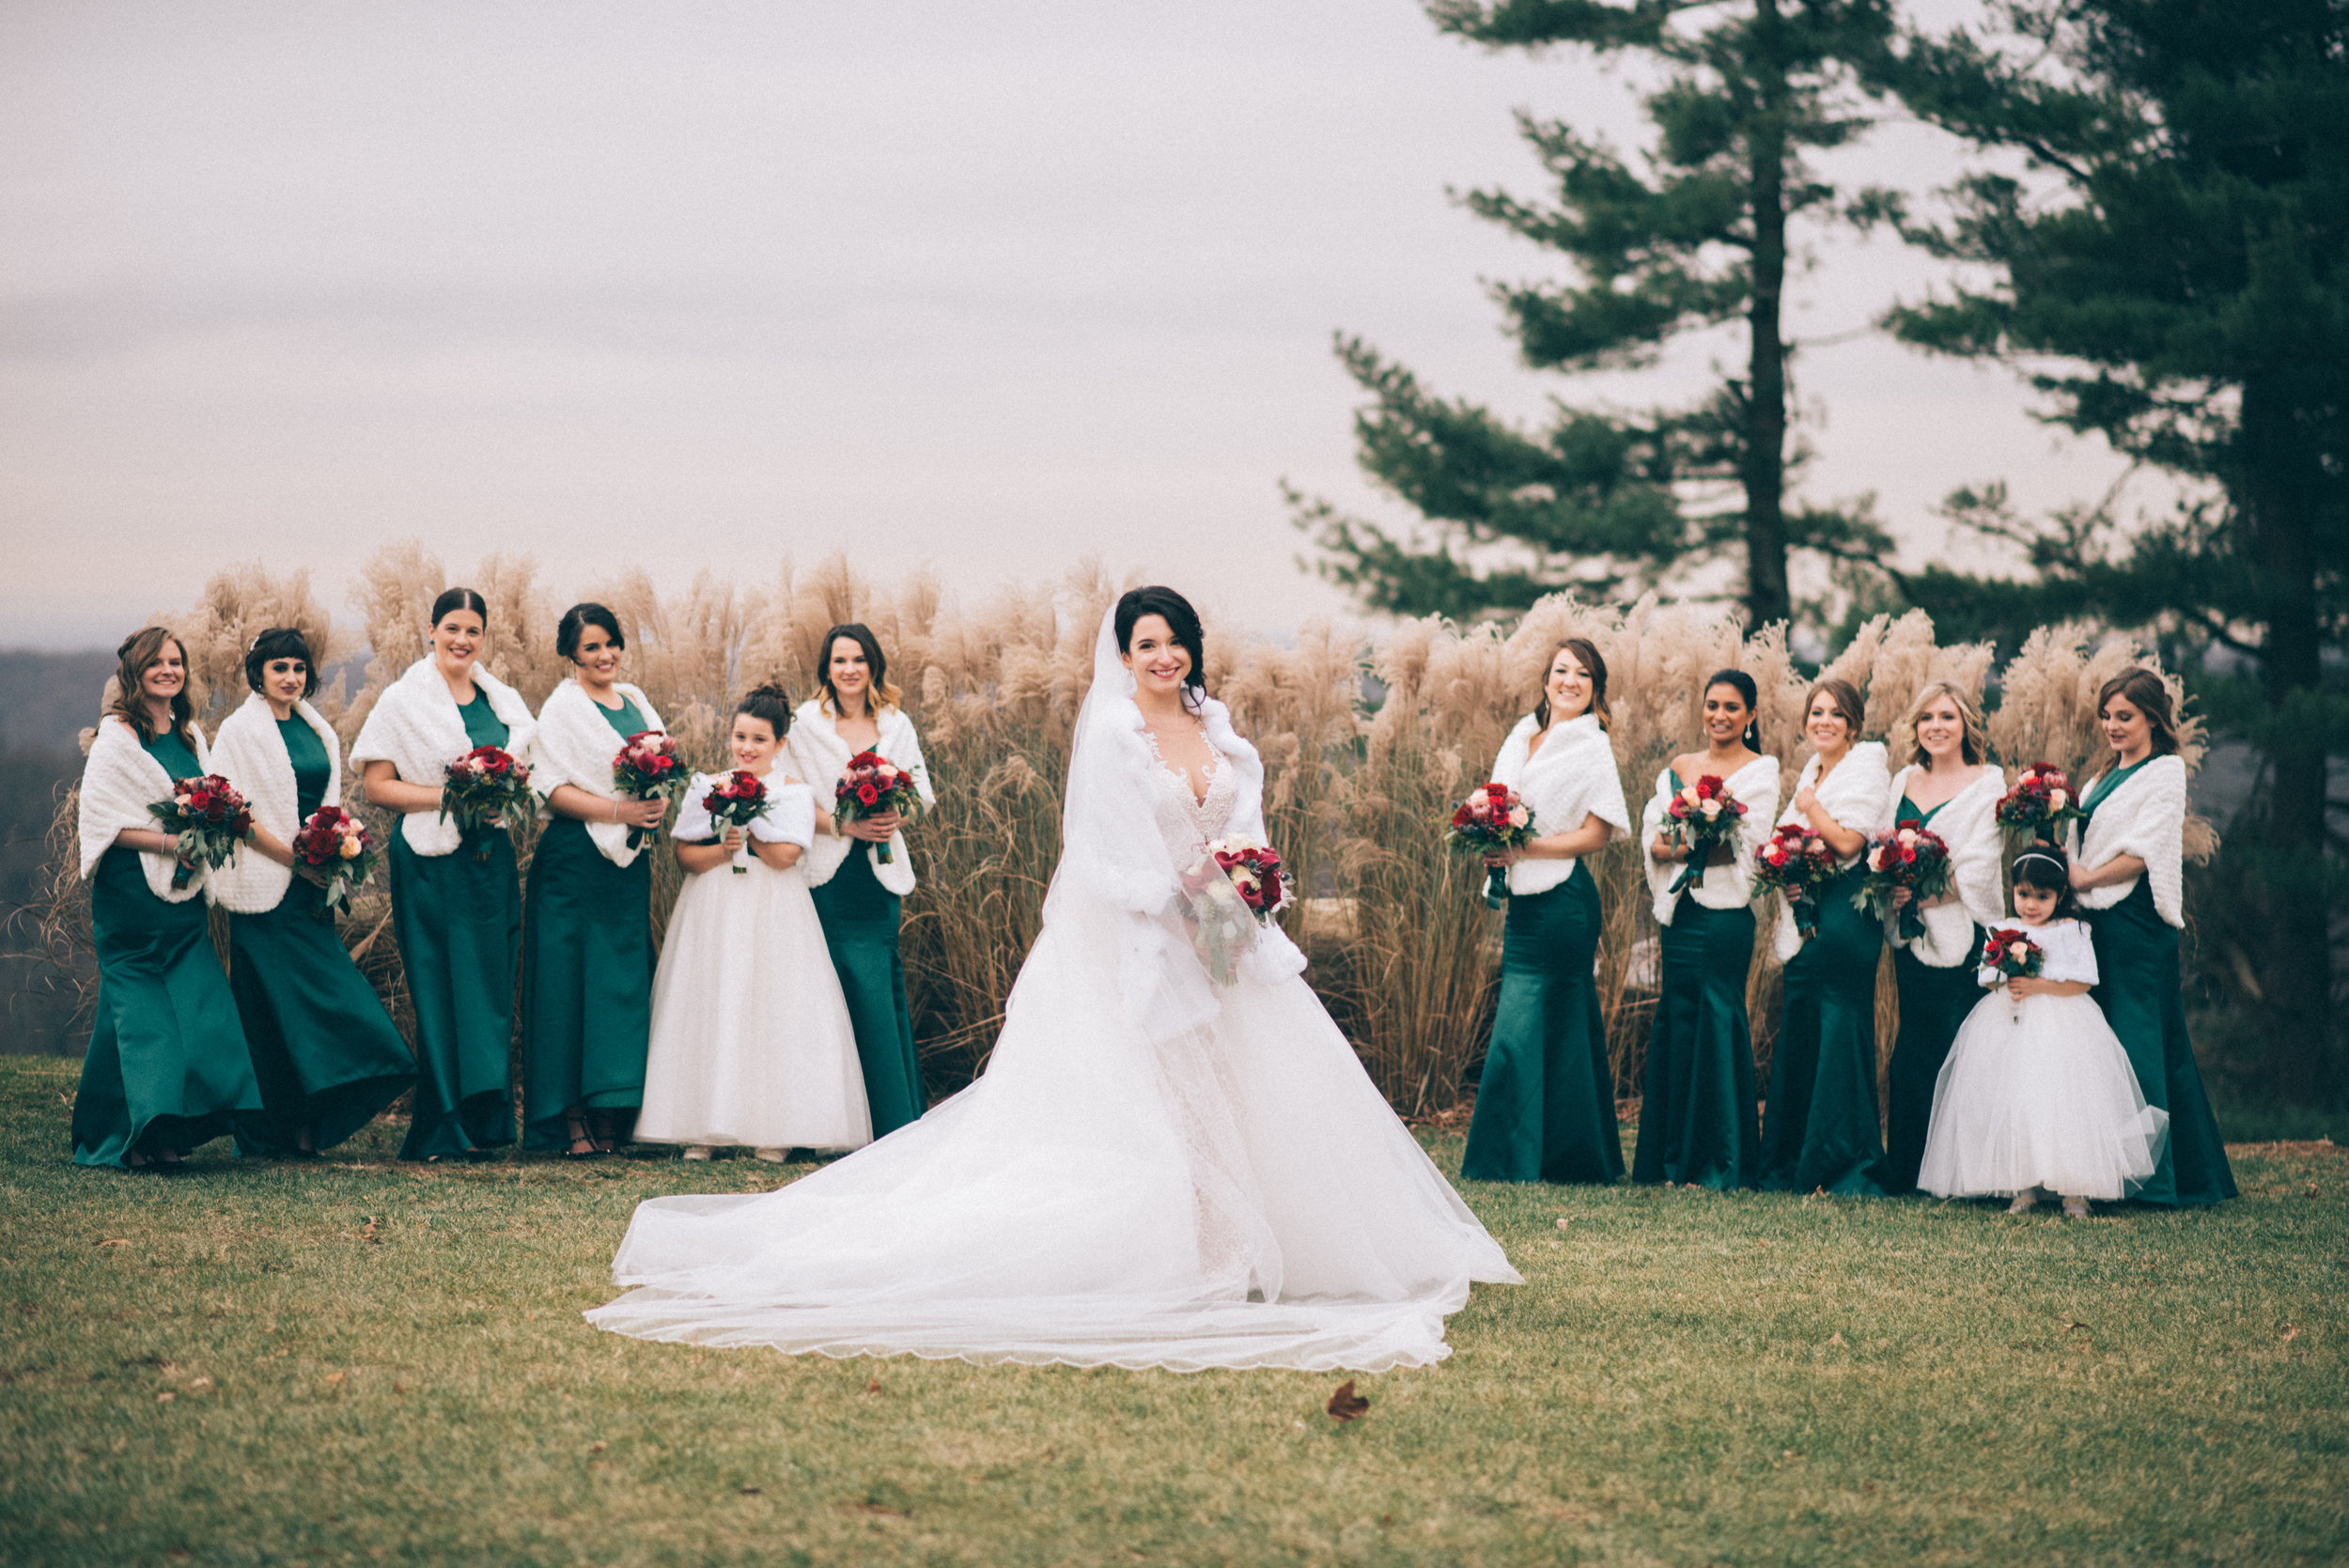 WeddingPhotos | NJPhotographer | Highlights-10-25.jpg